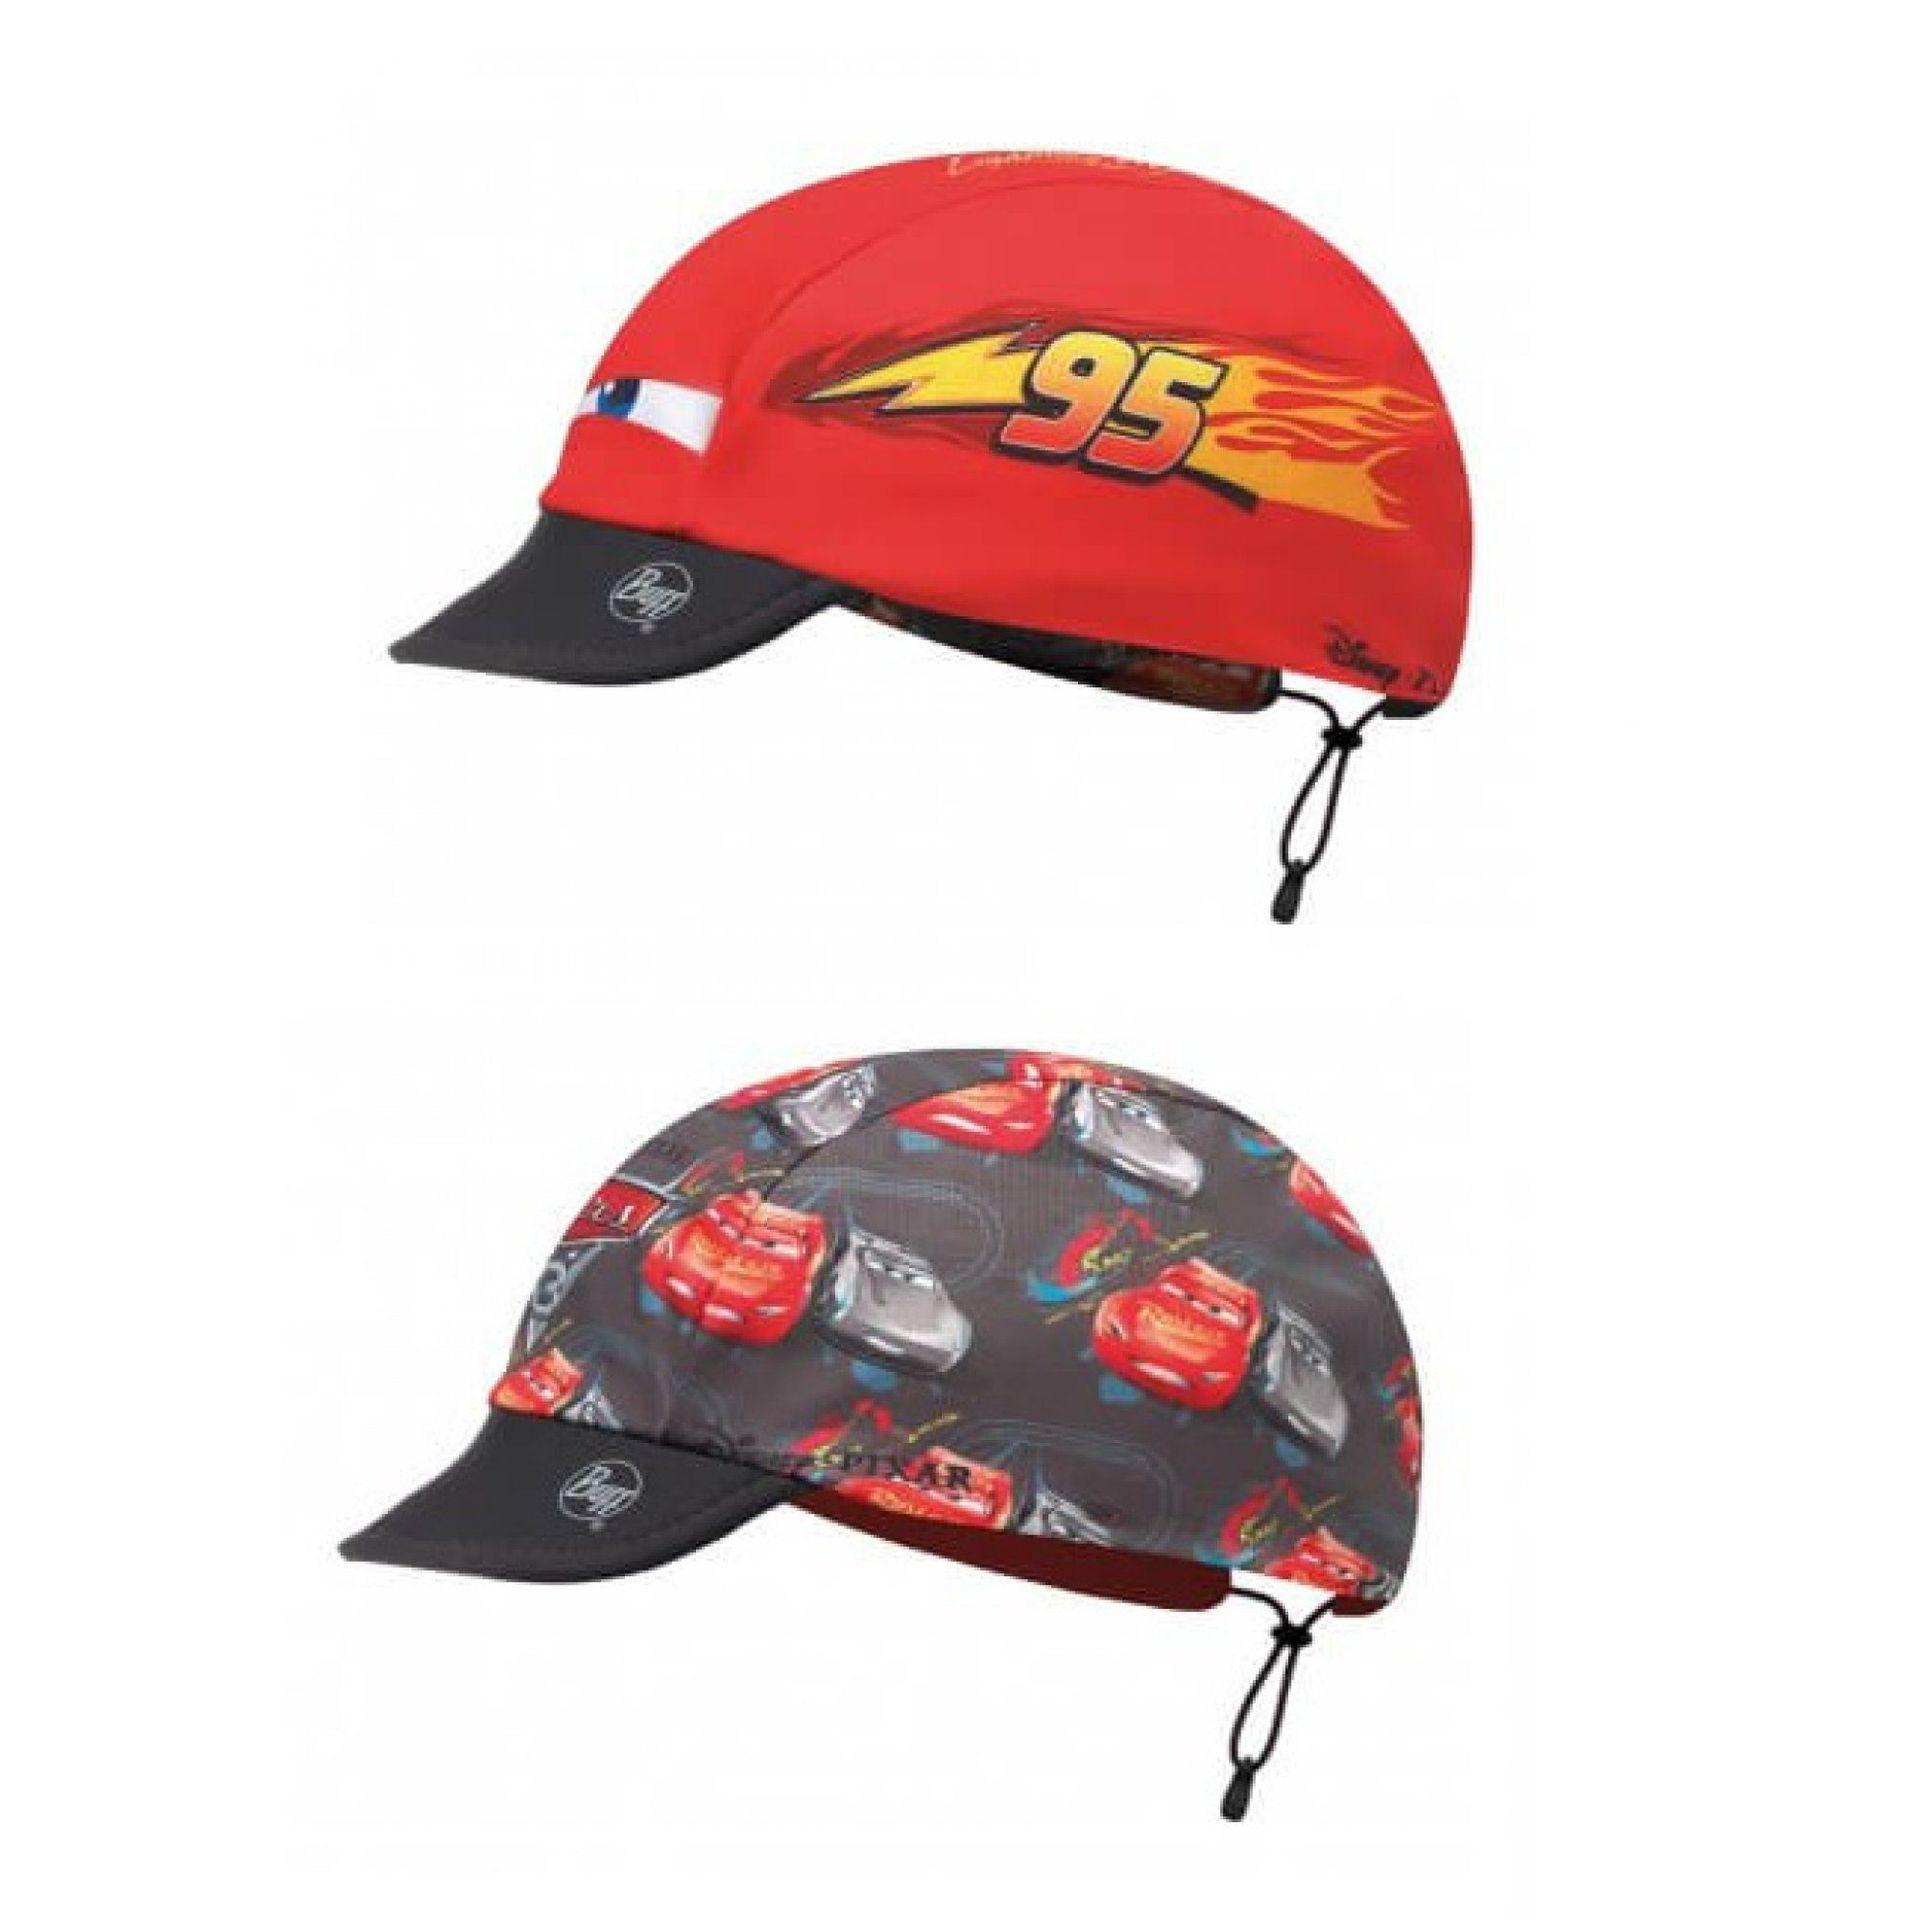 CZAPKA DWUSTRONNA BUFF  CHILD CAP CARS LIGHTING MCQUEEN RED MULTI